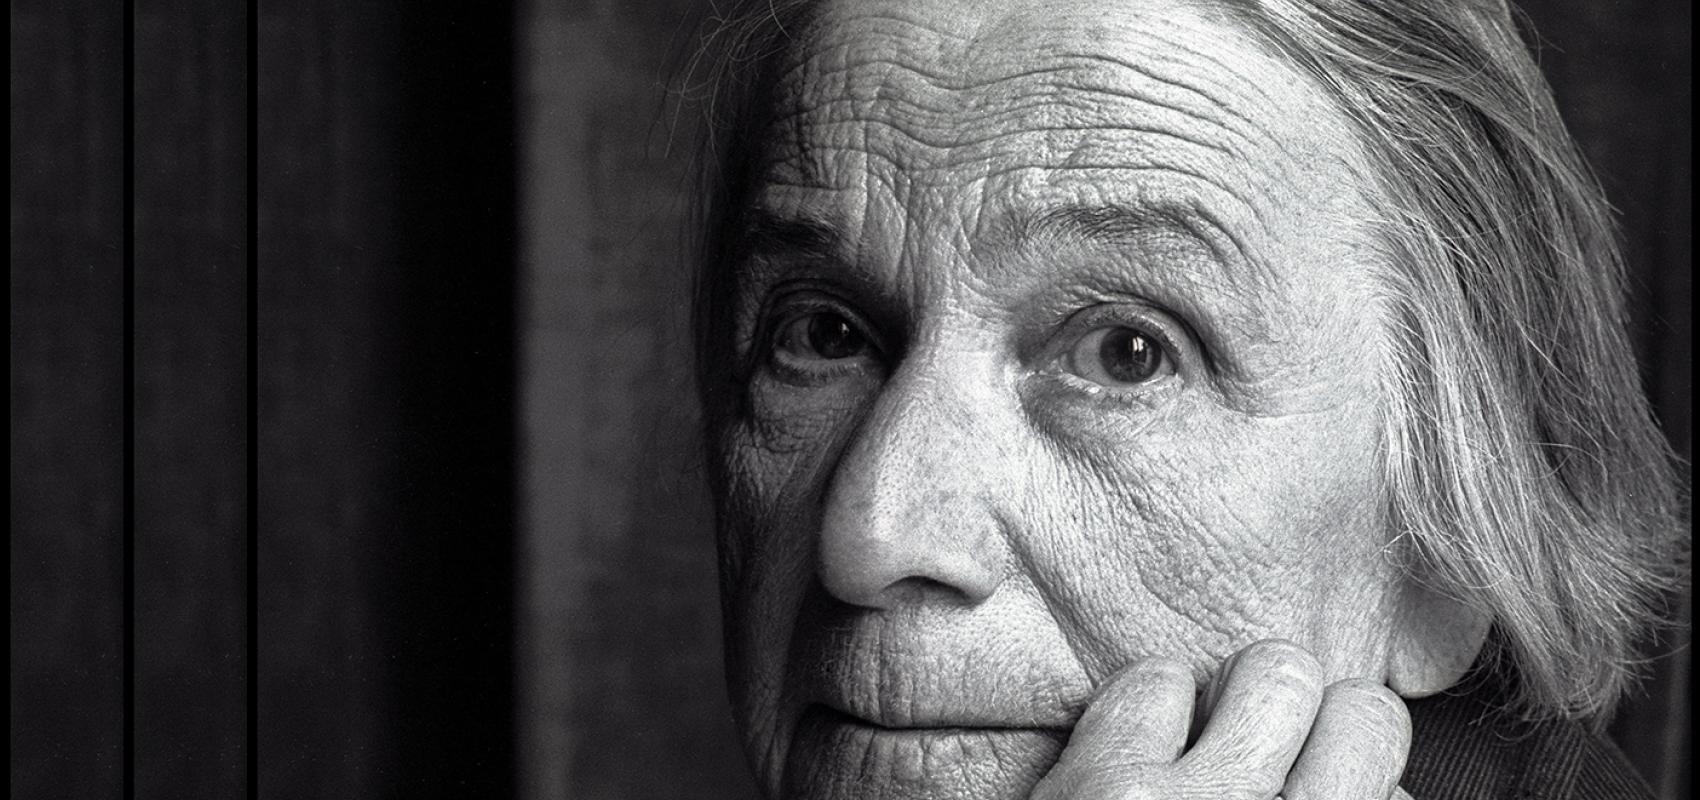 Nathalie Sarraute vingt ans après (Diakritik.com)